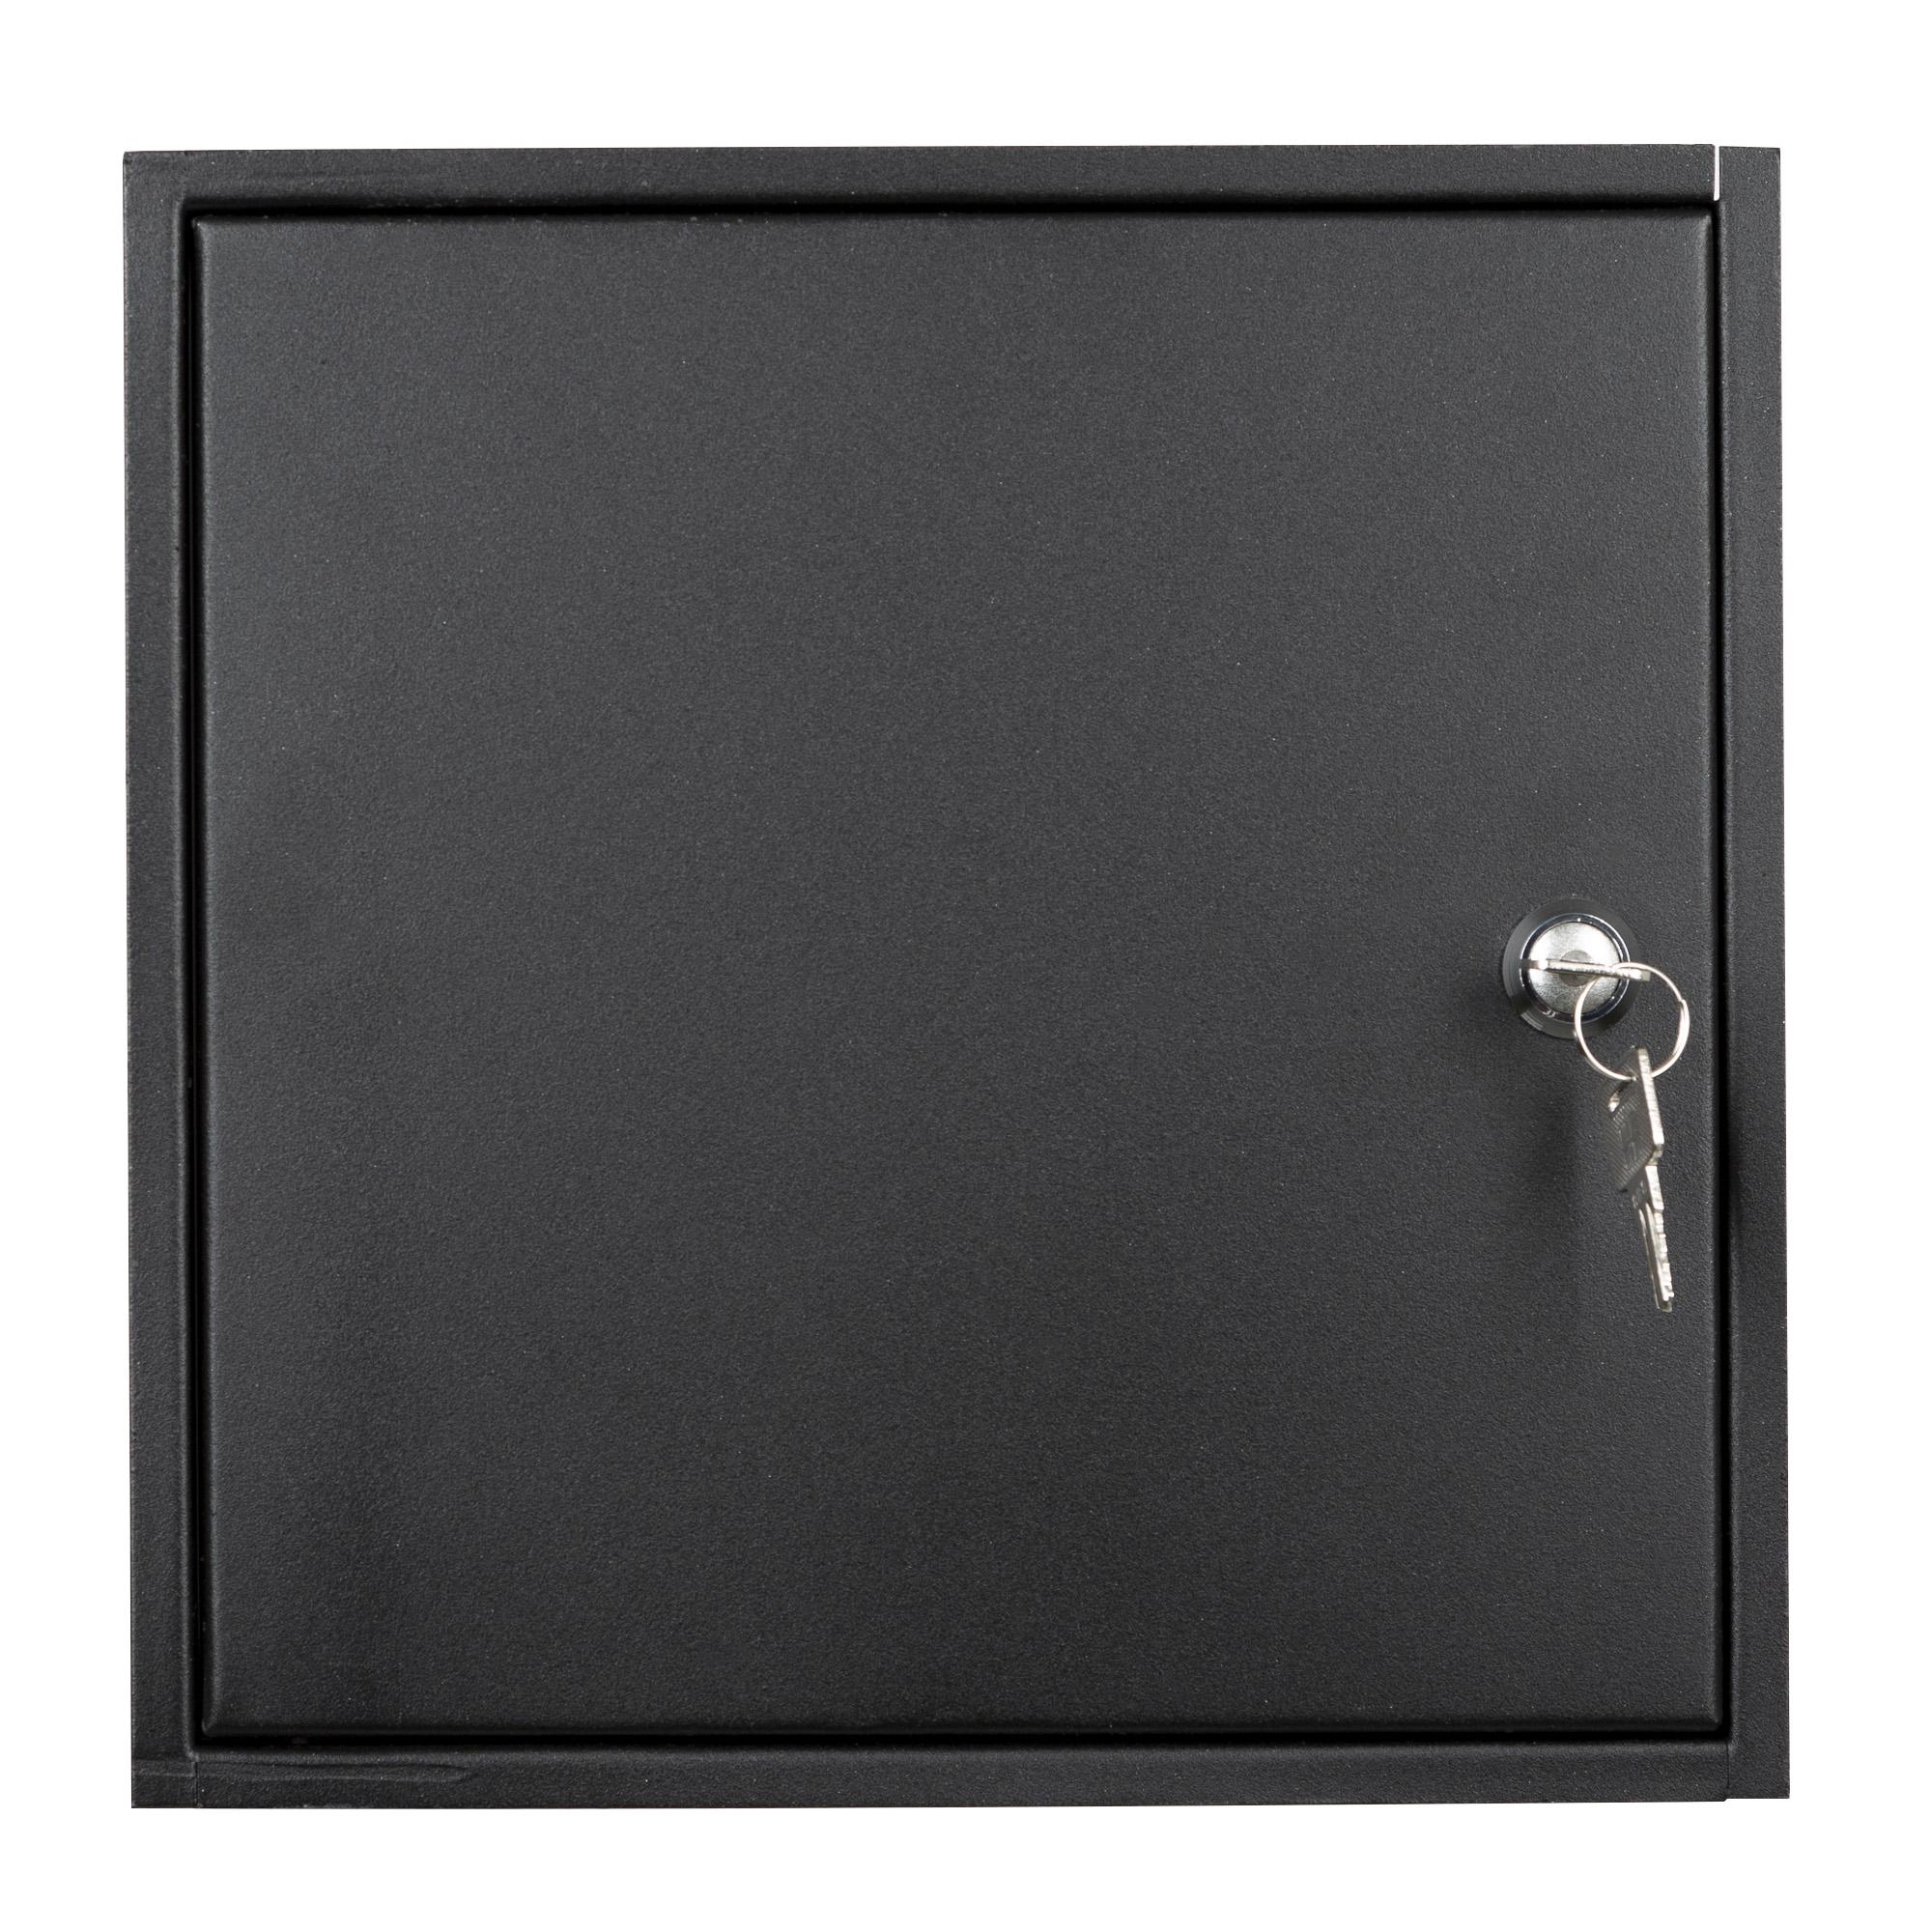 RVS brievenbus deur inbouw mat zwart